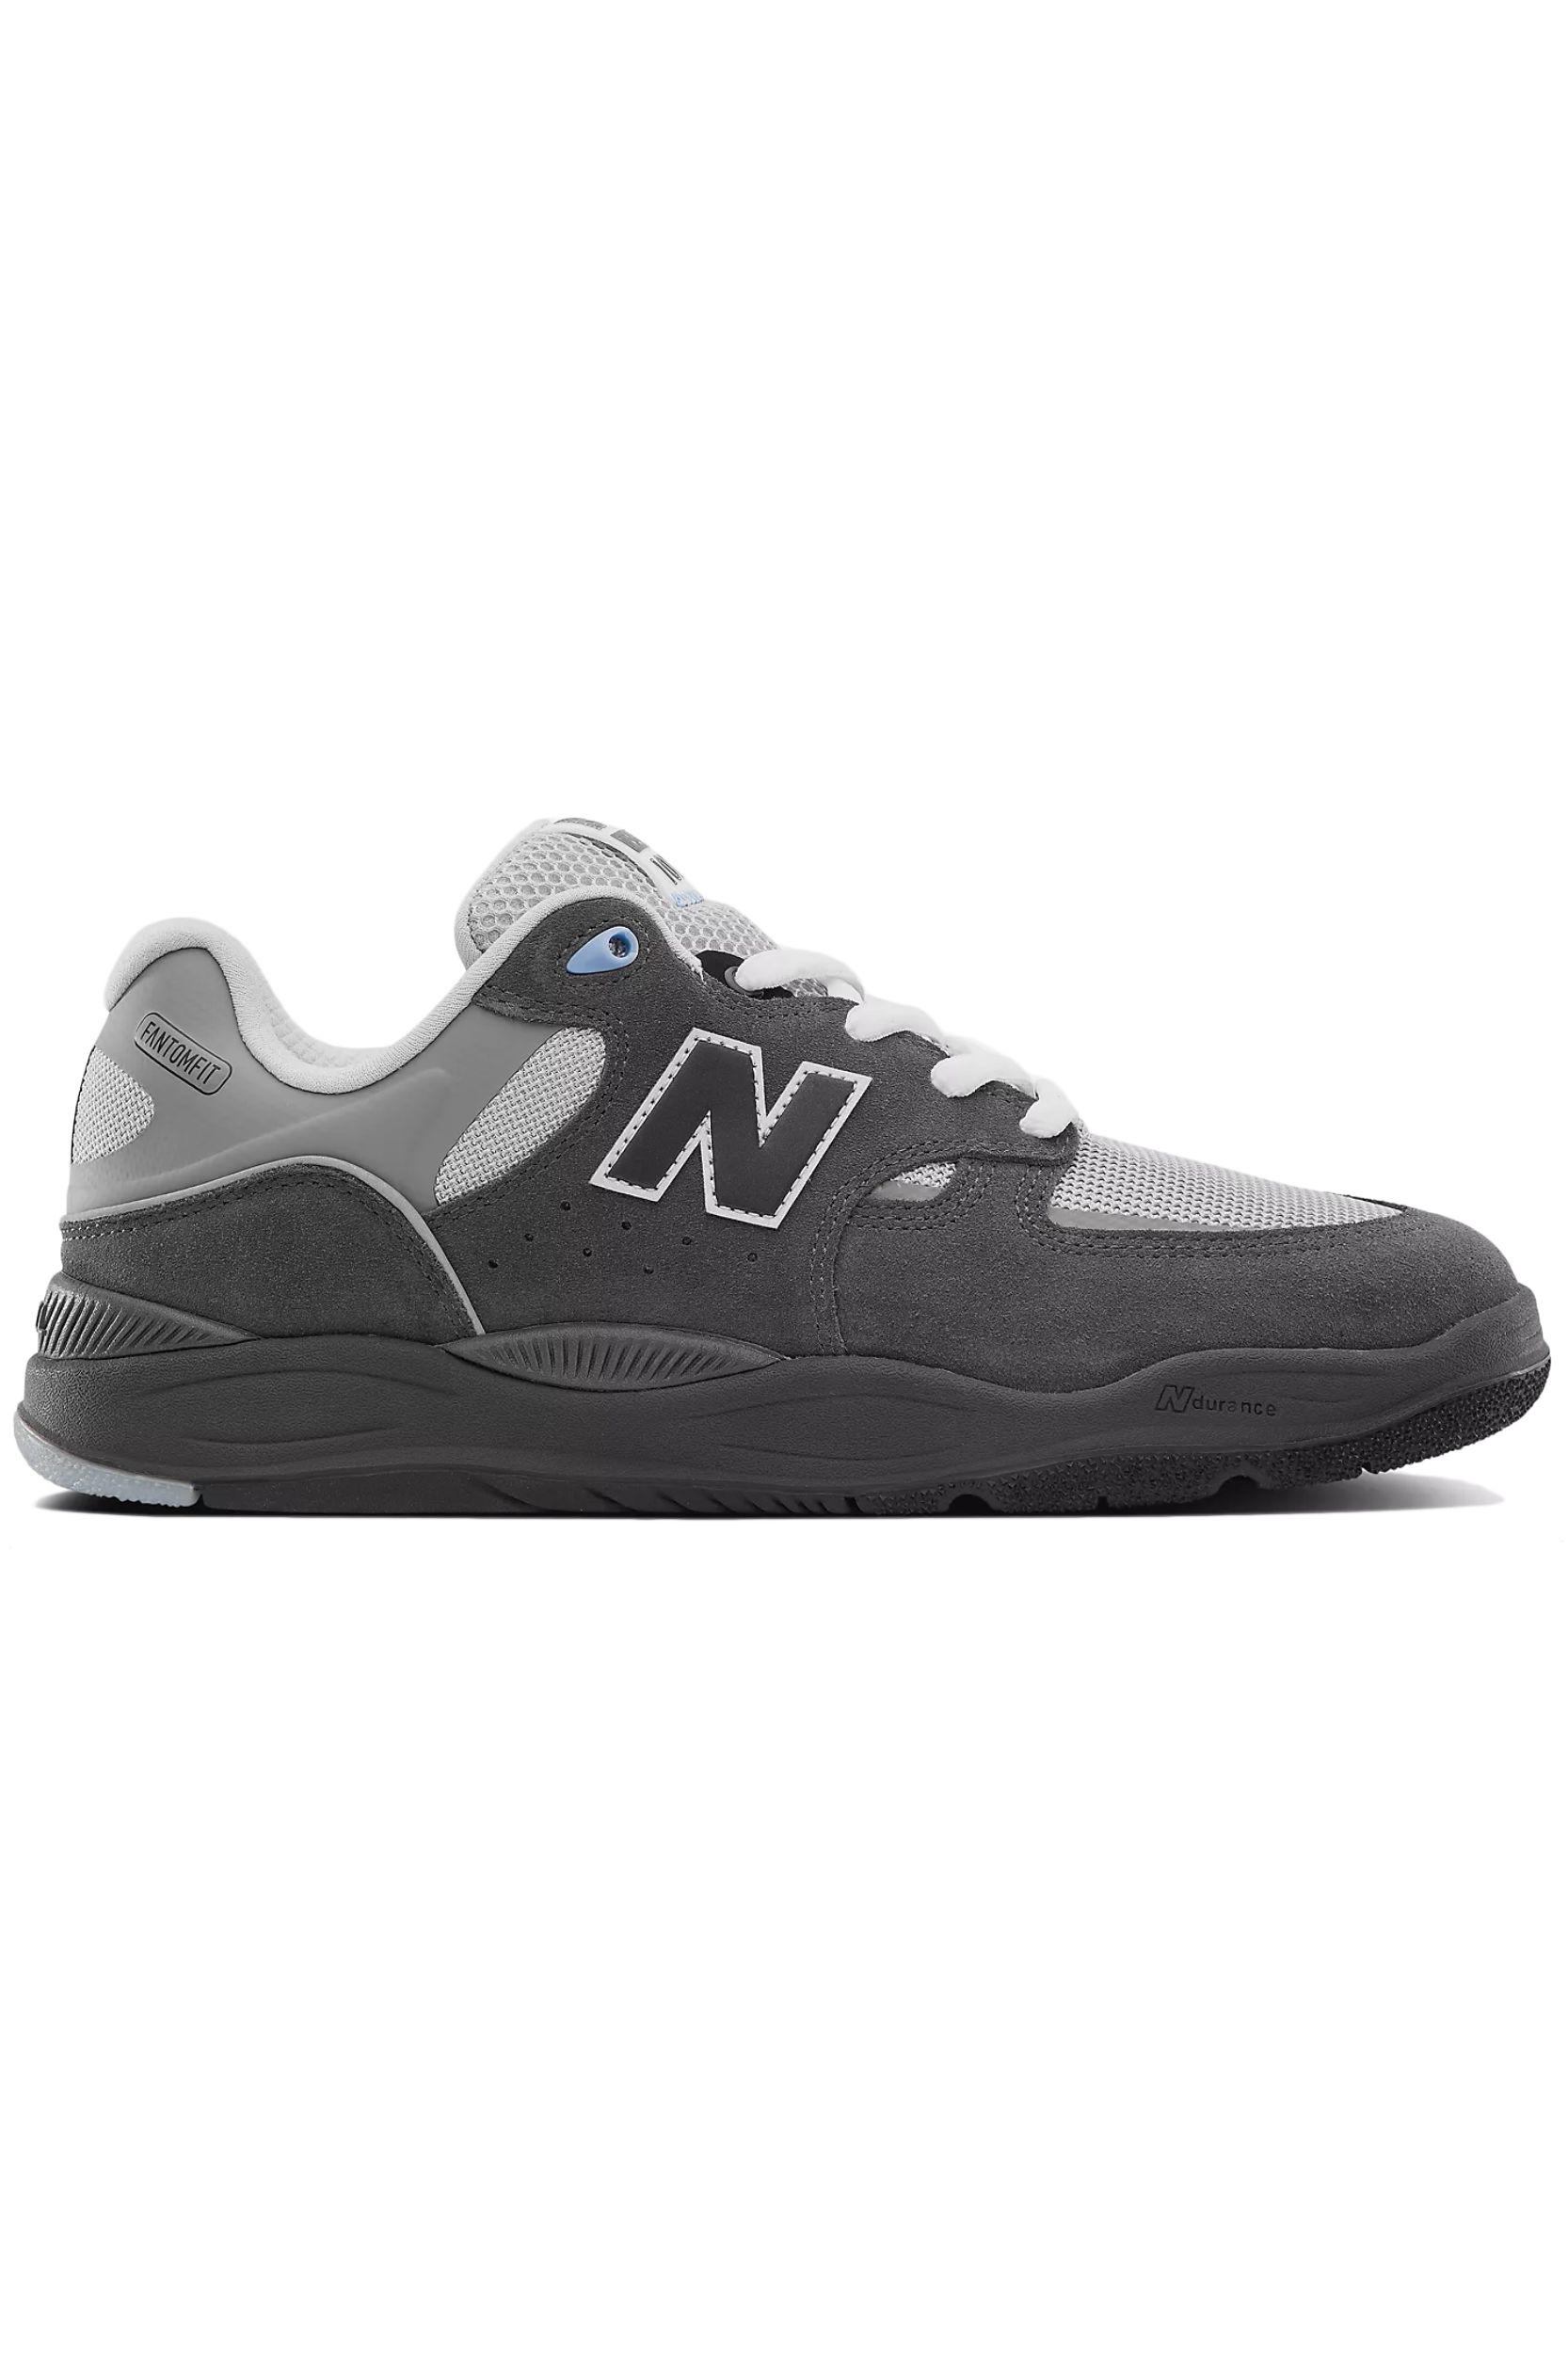 Tenis New Balance NM1010 Grey/Lime